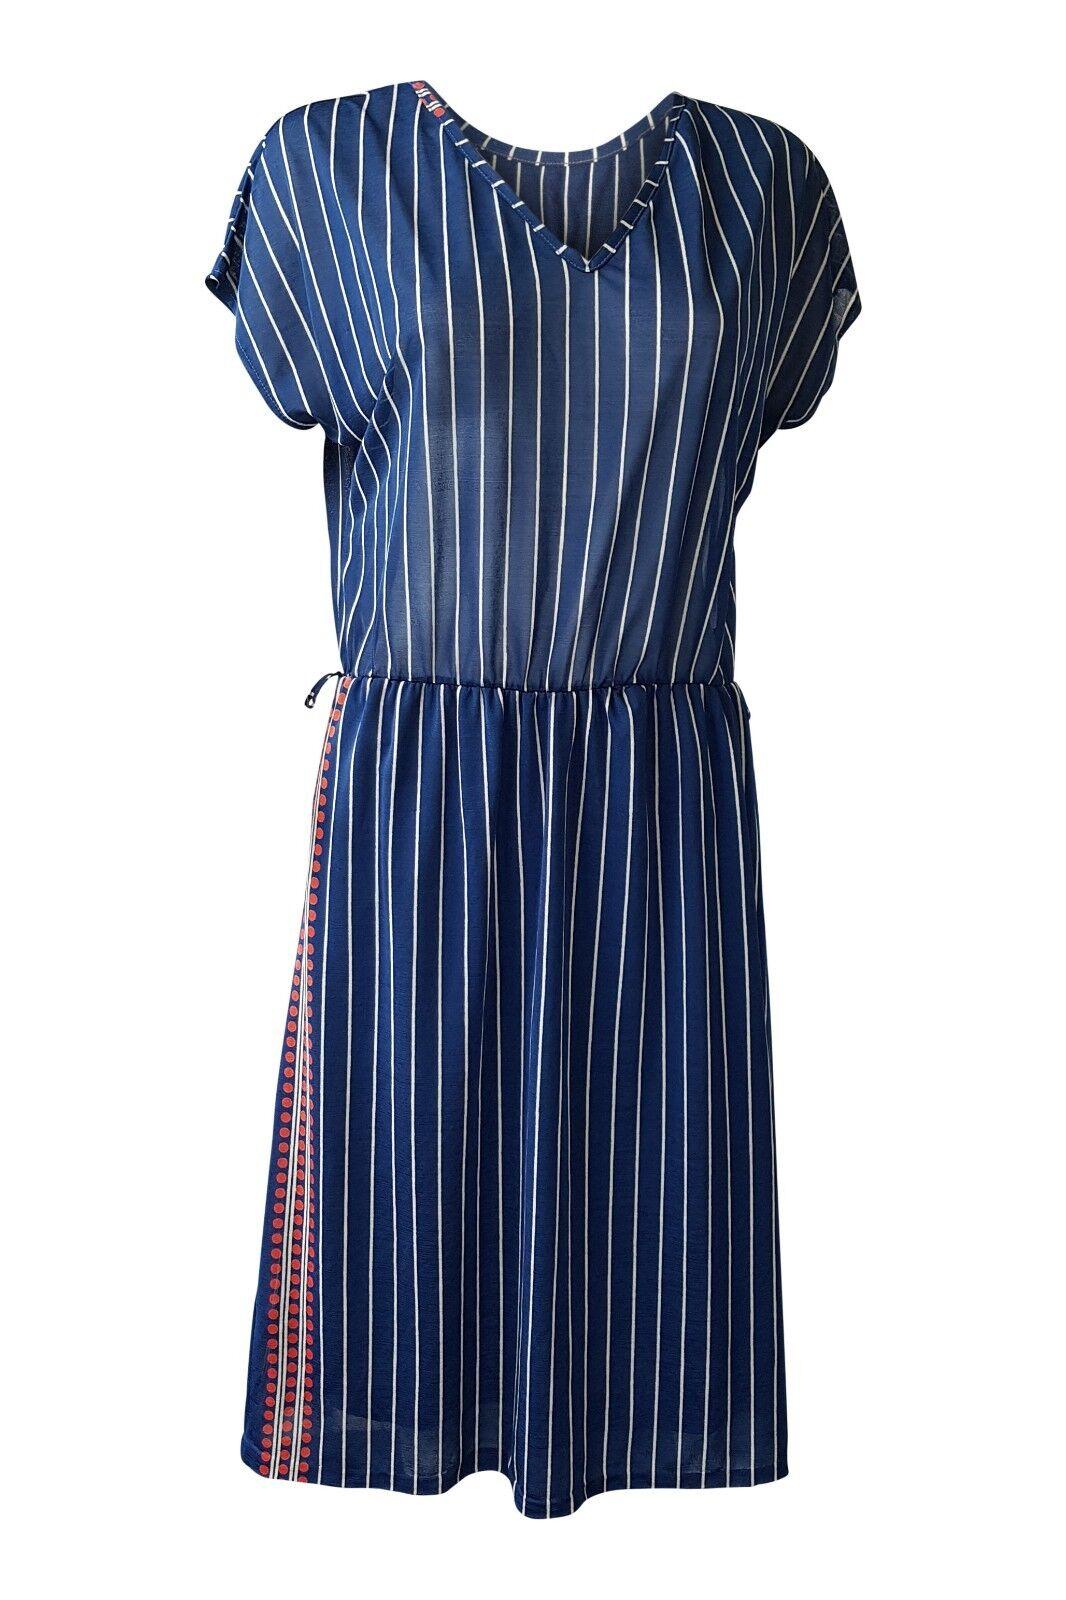 UNBRANDED VINTAGE blueE PINSTRIPE DRESS